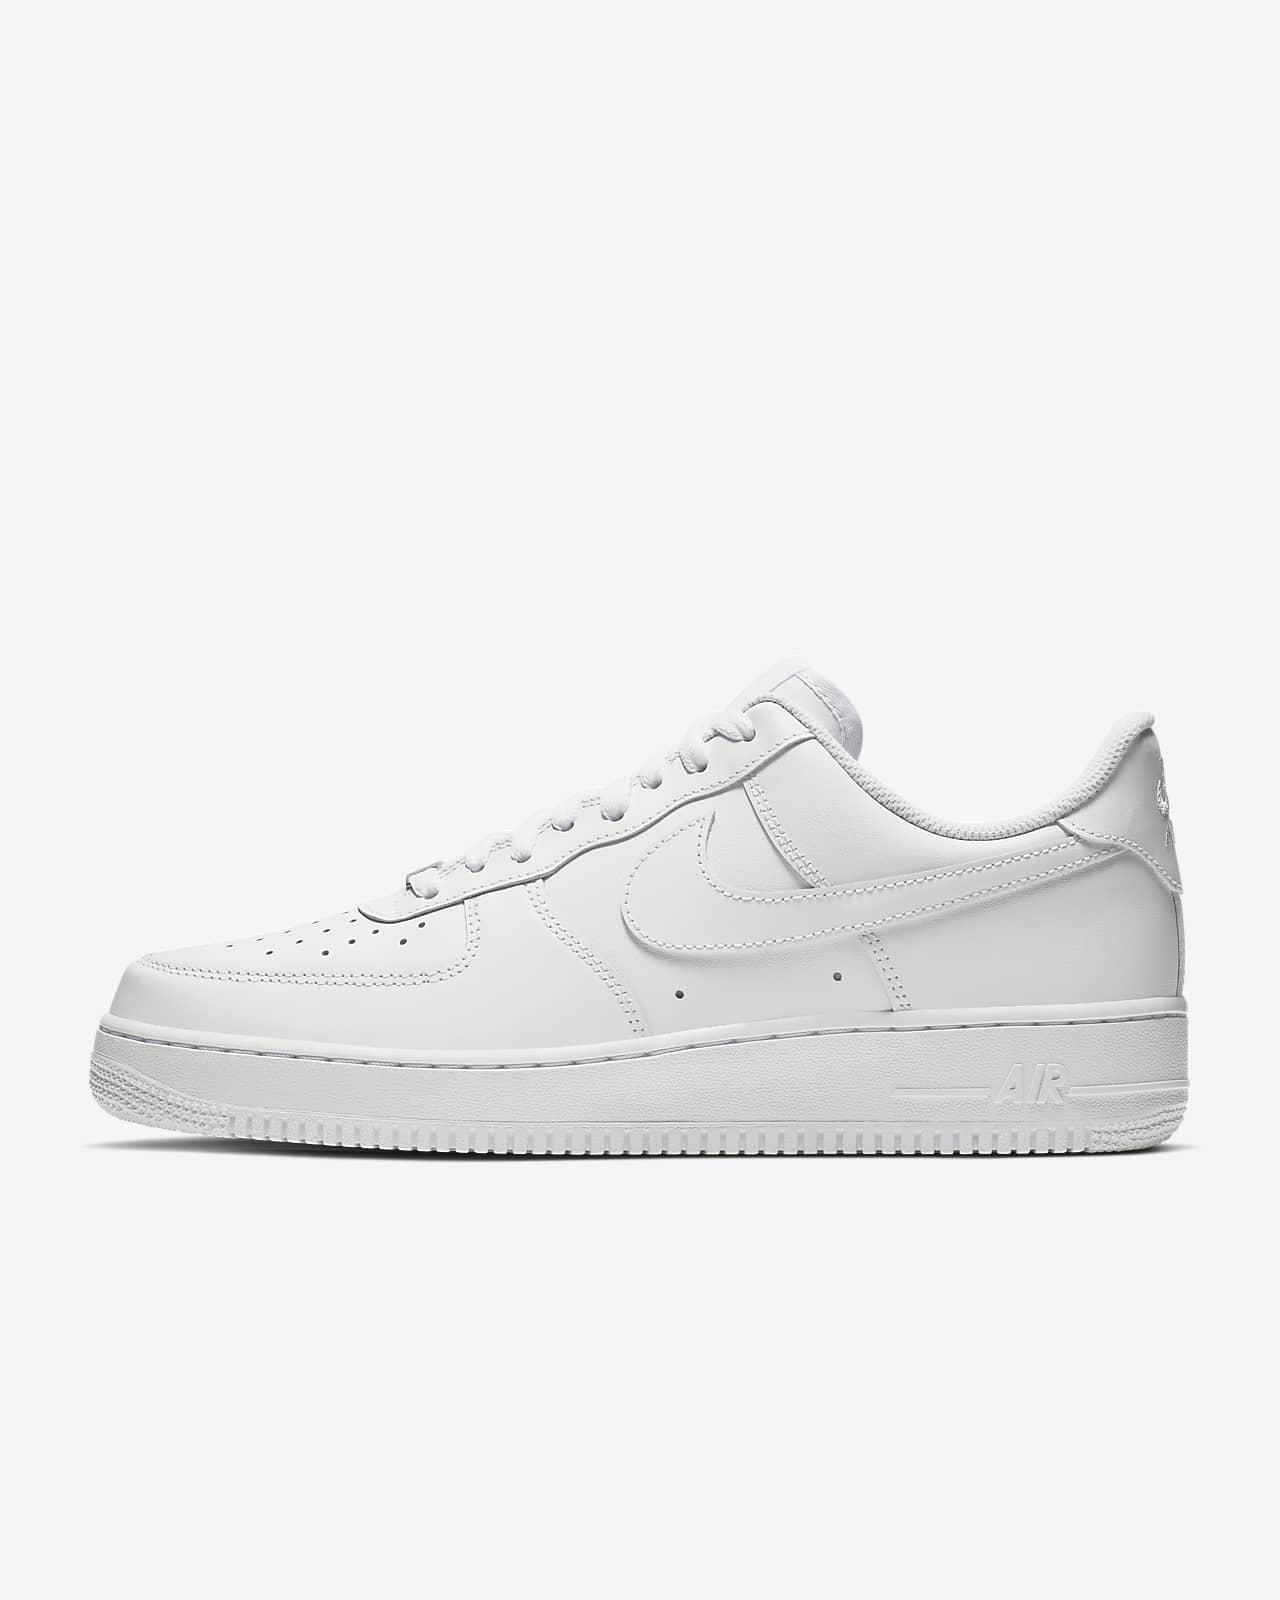 Herre Sko. Nike NO